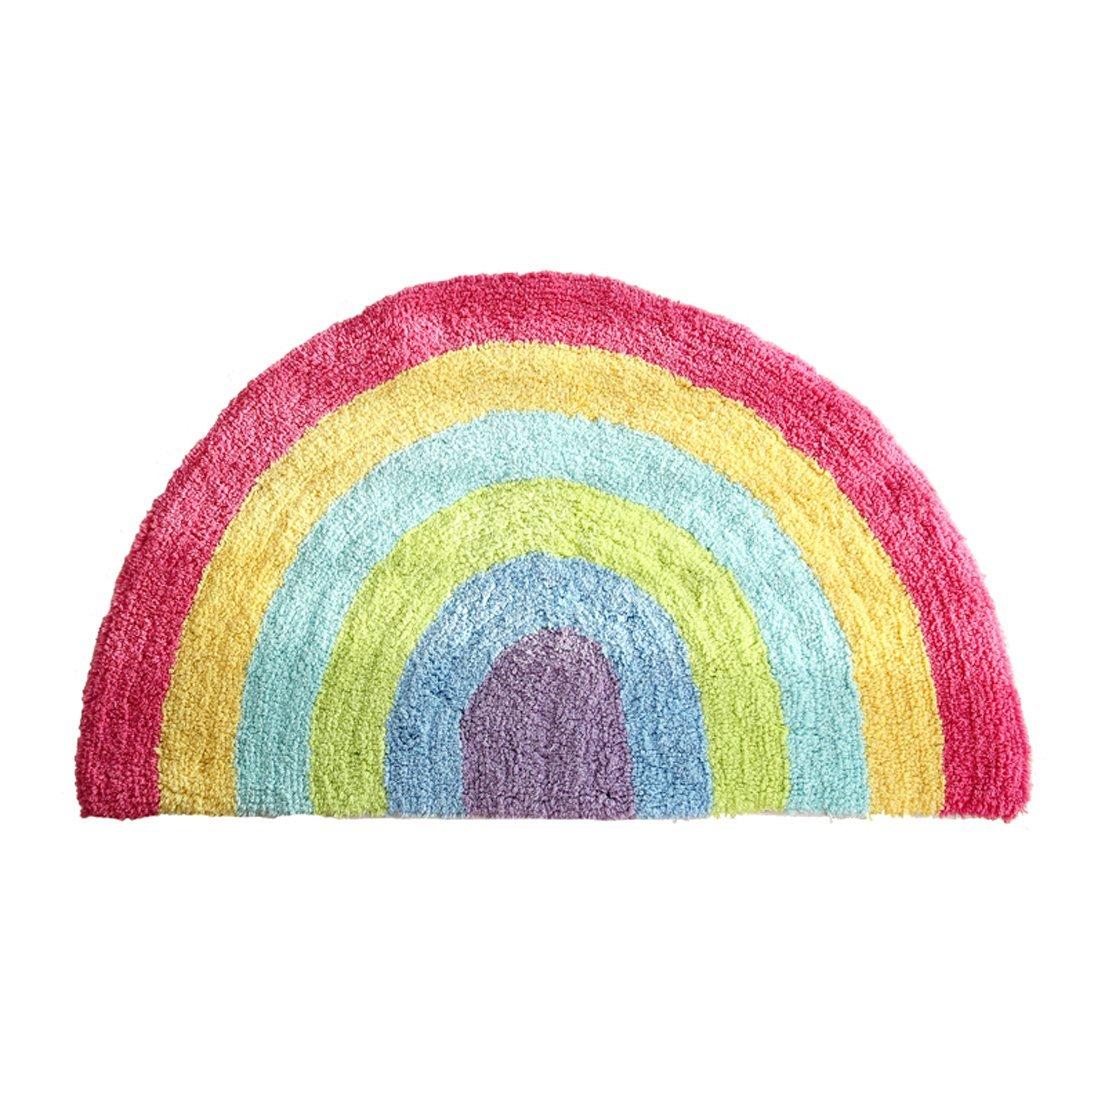 Buy Habudda Nursery Area Rugs Soft Cotton Cute Door Mat For